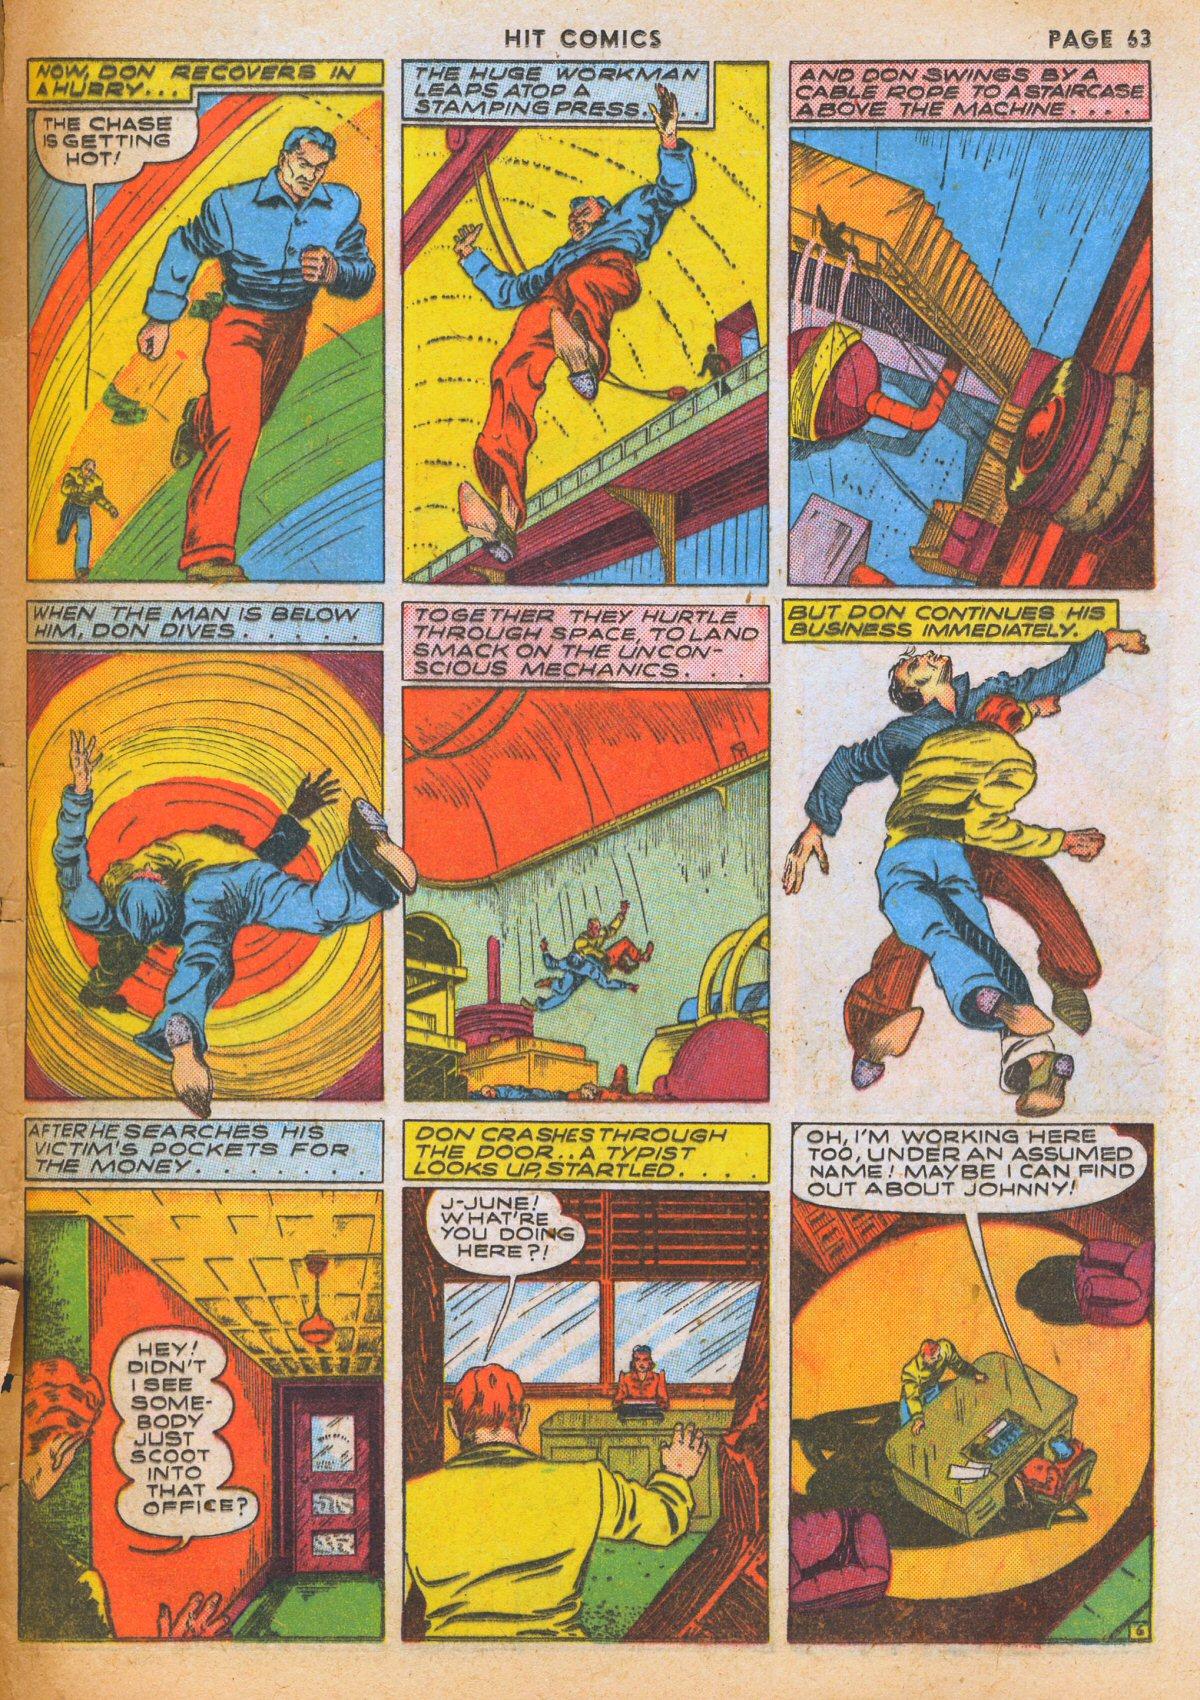 Read online Hit Comics comic -  Issue #12 - 65